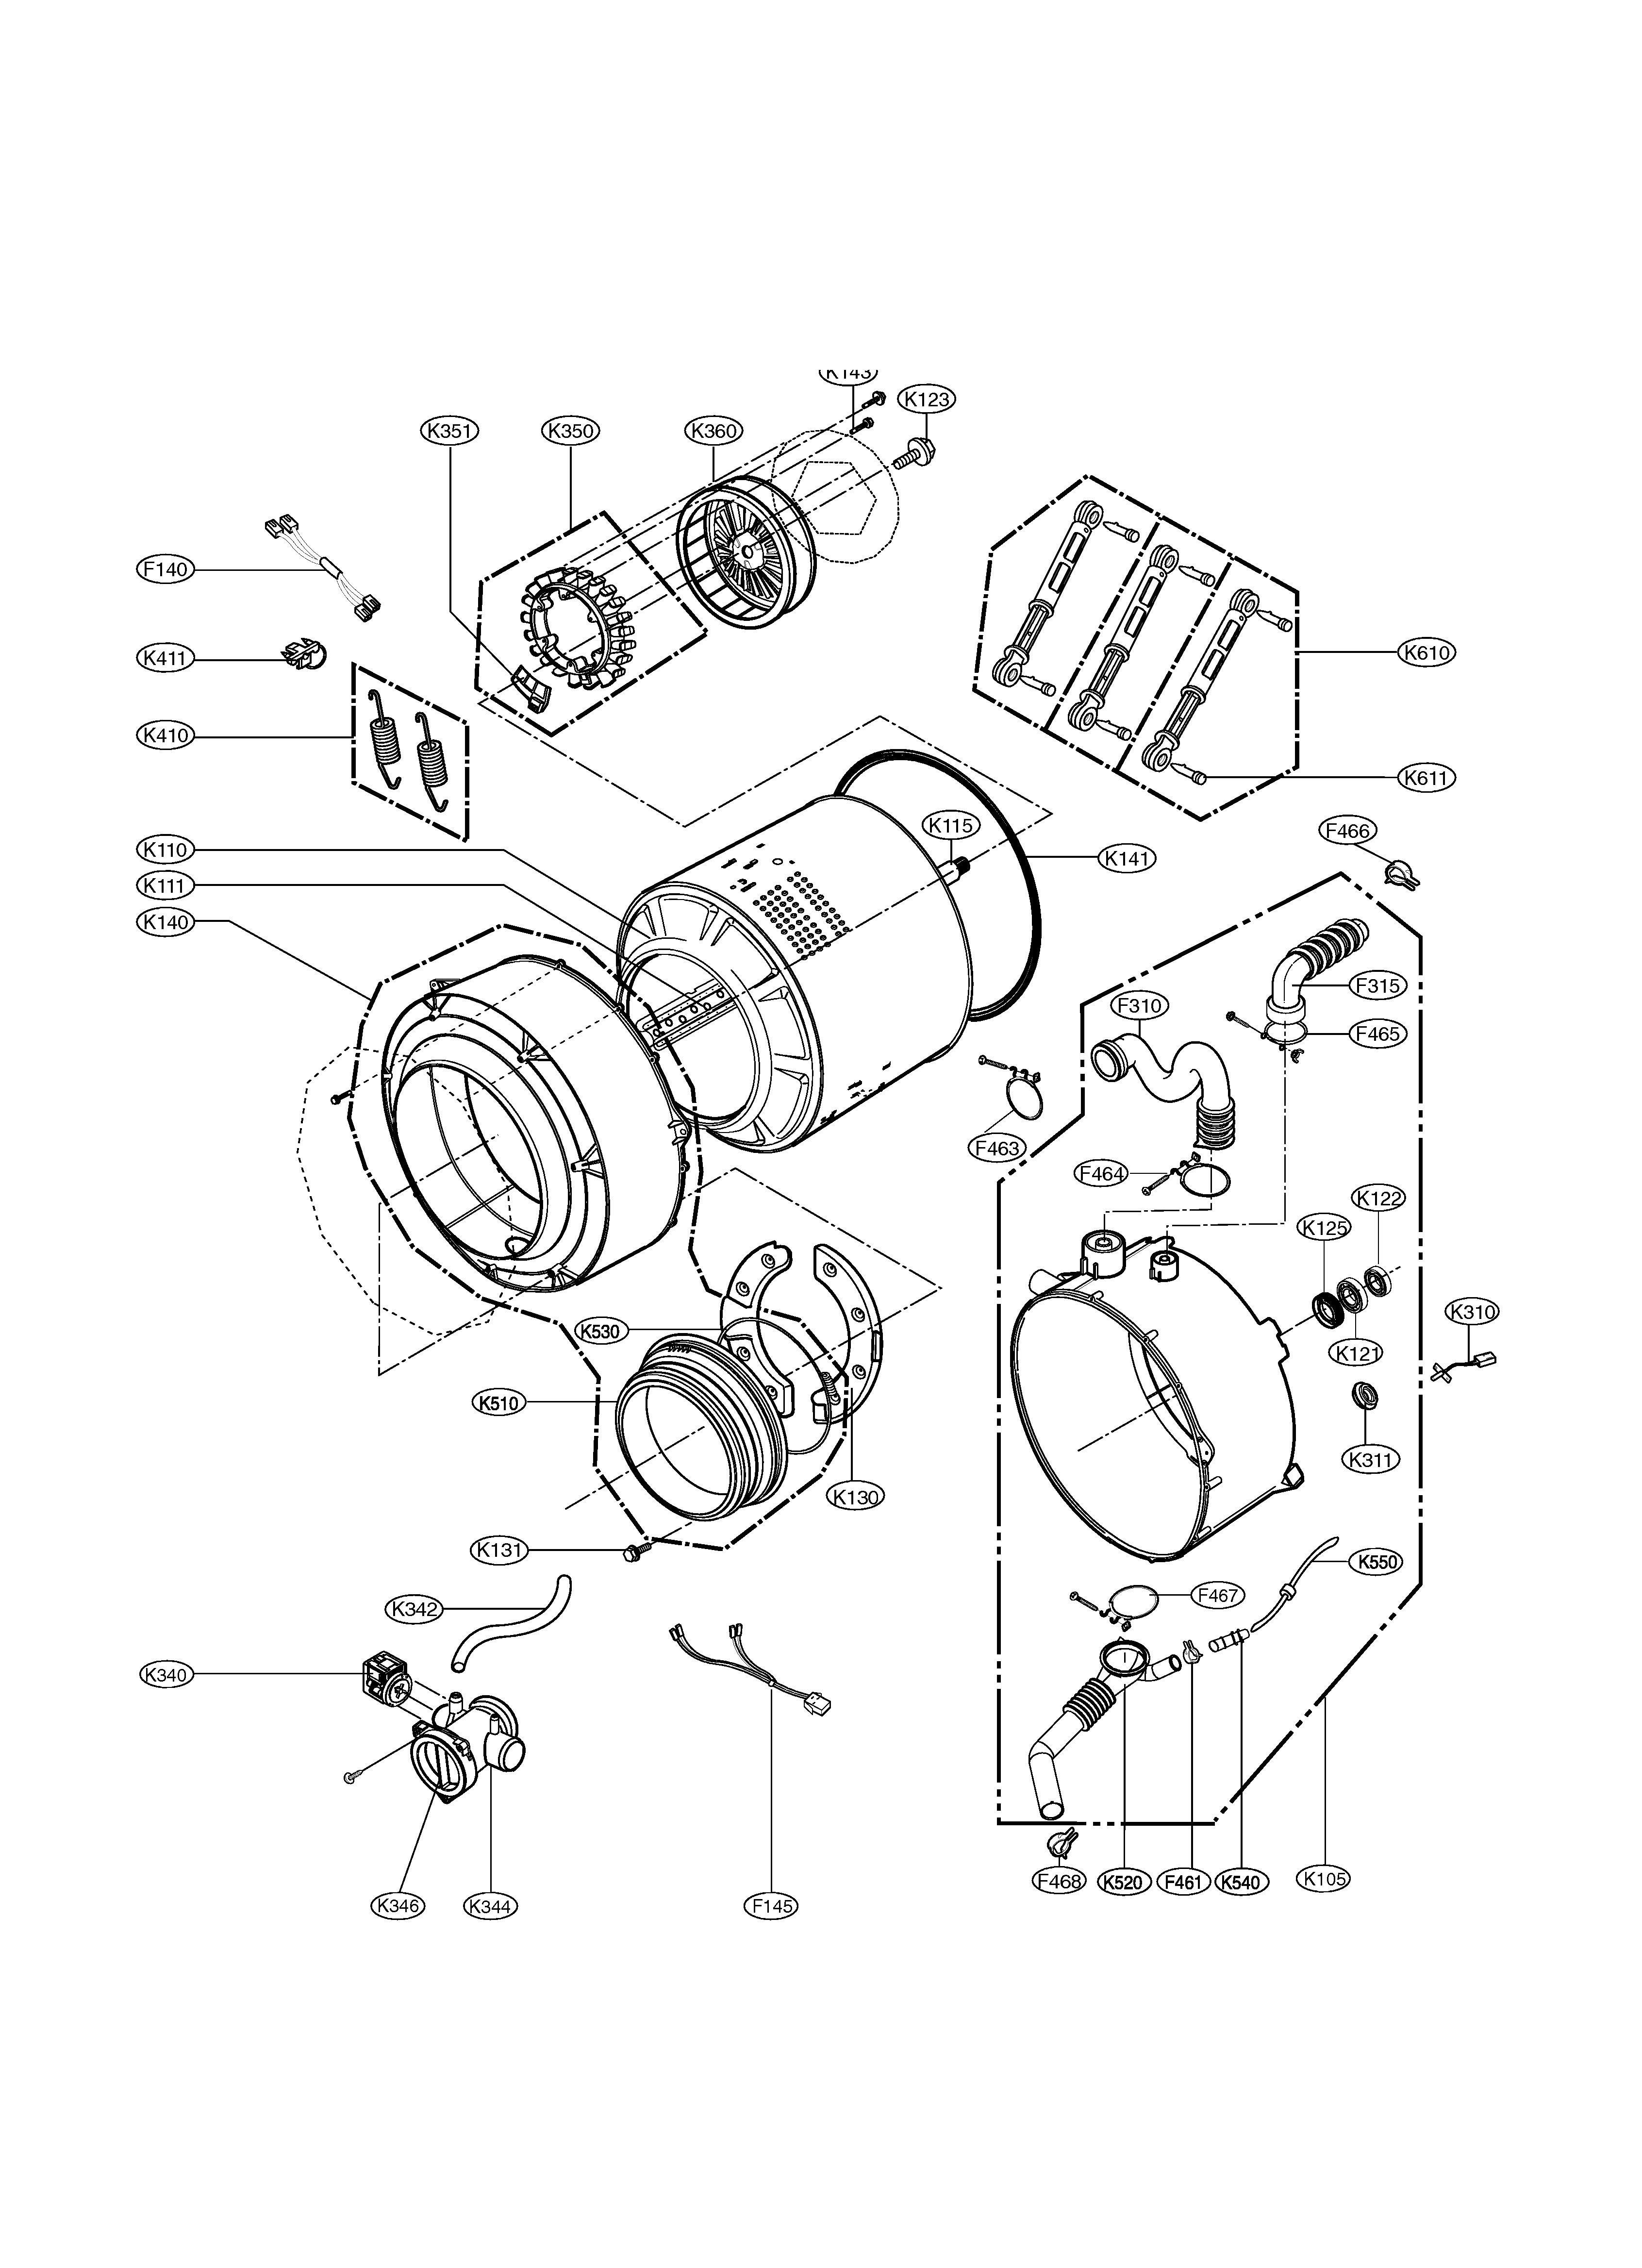 DRUM & TUB Diagram & Parts List for Model WM1814CW LG